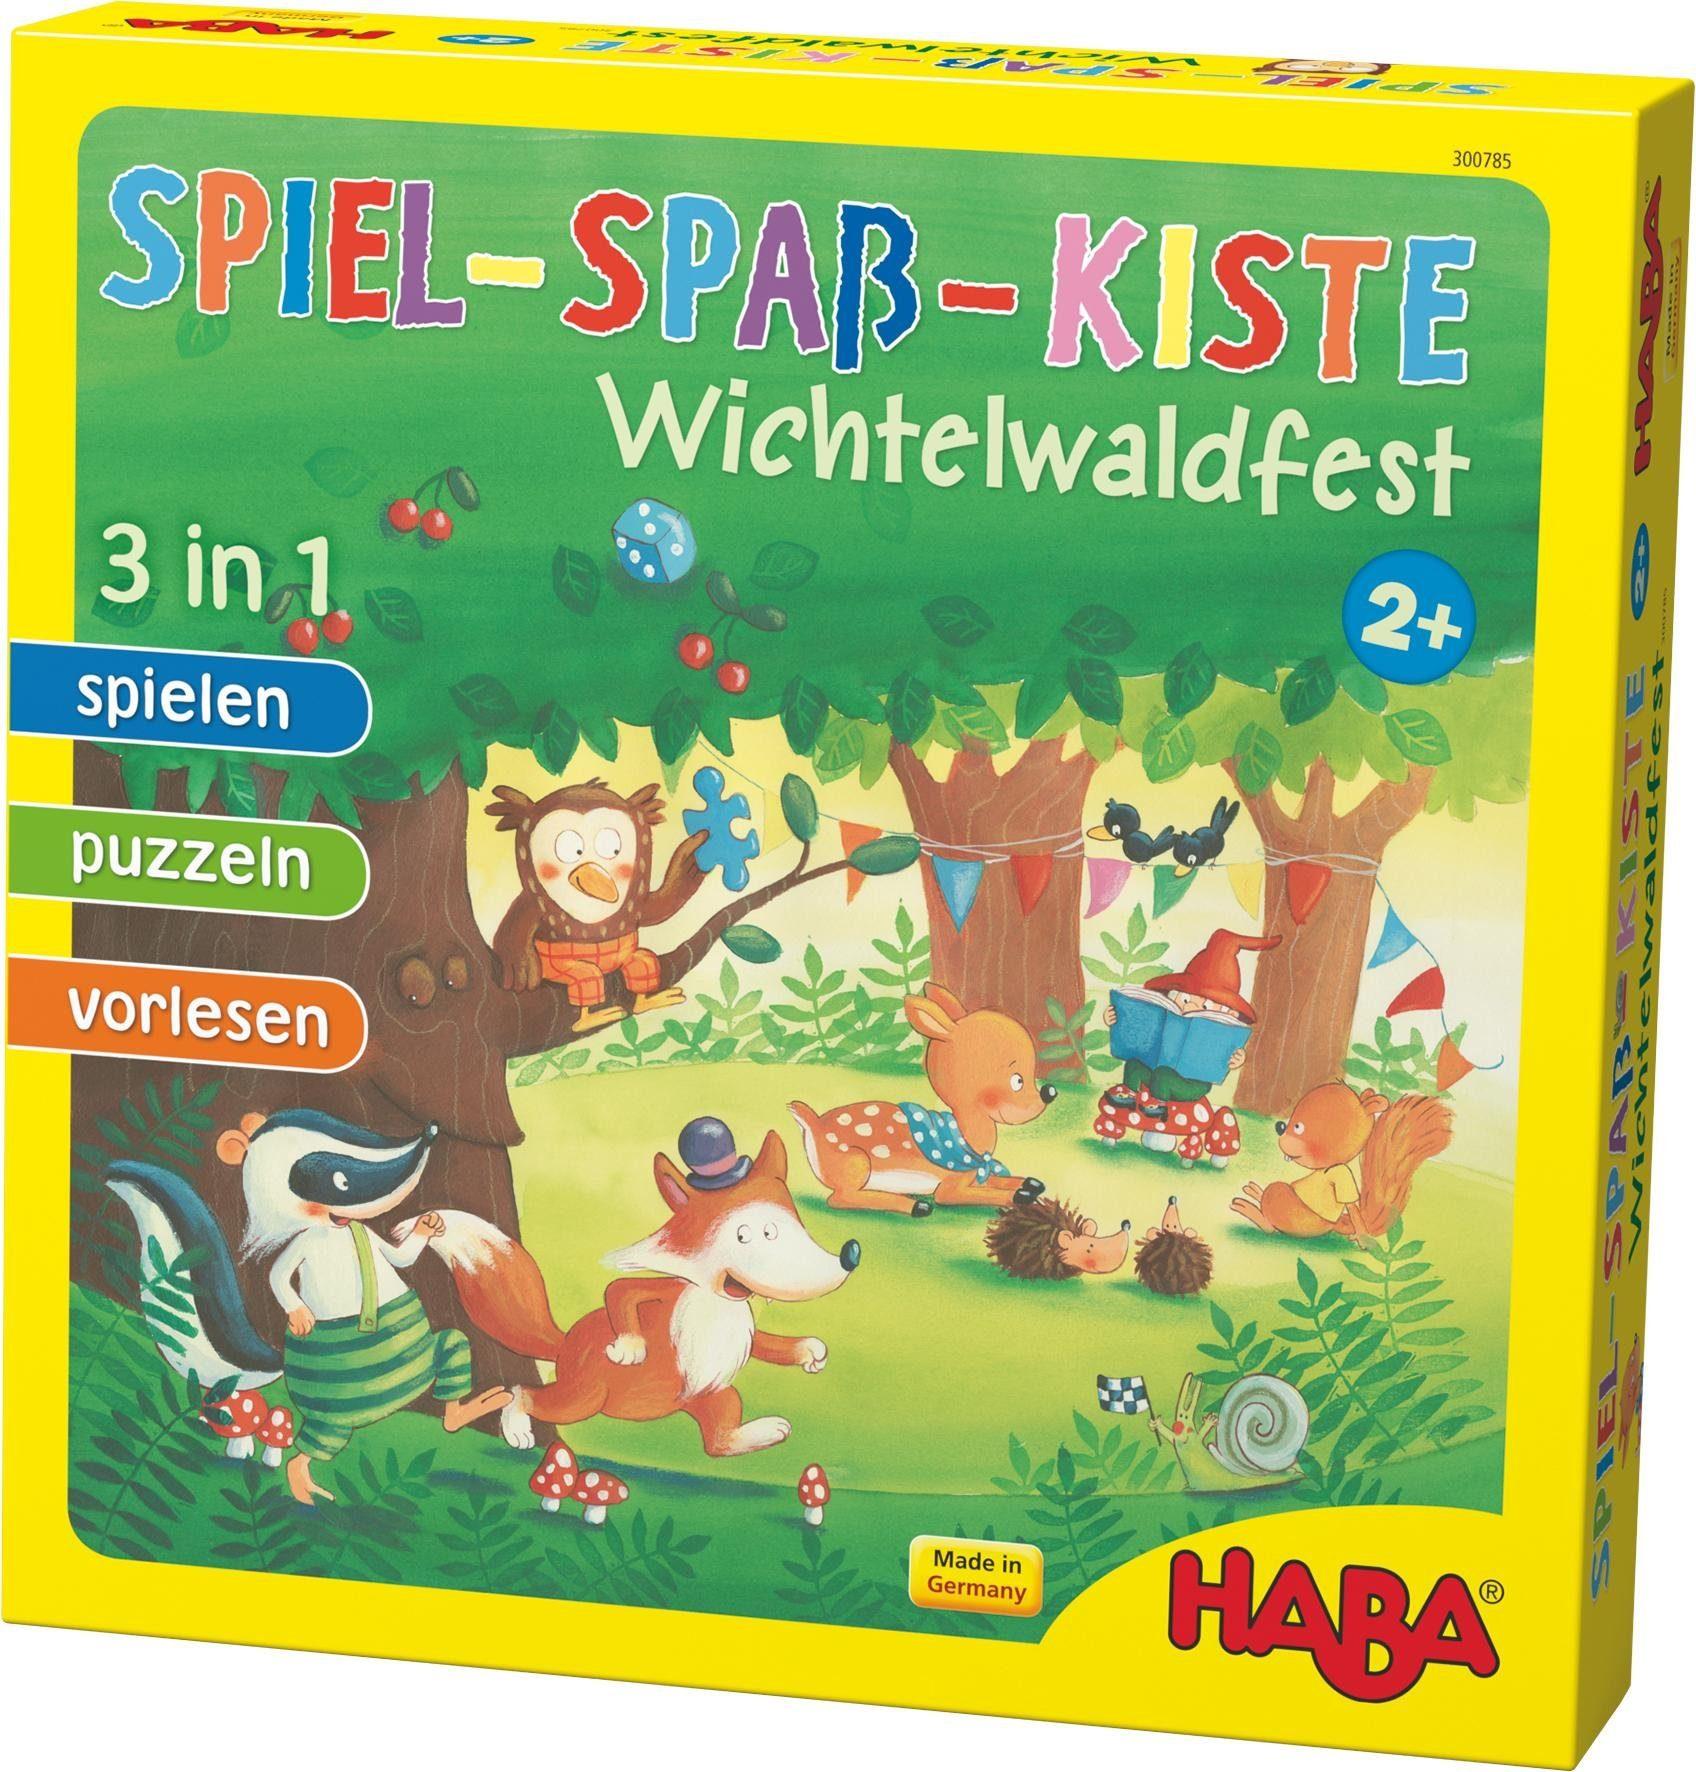 HABA® Kinderspiel, »Spiel-Spaß-Kiste Wichtelwaldfest«